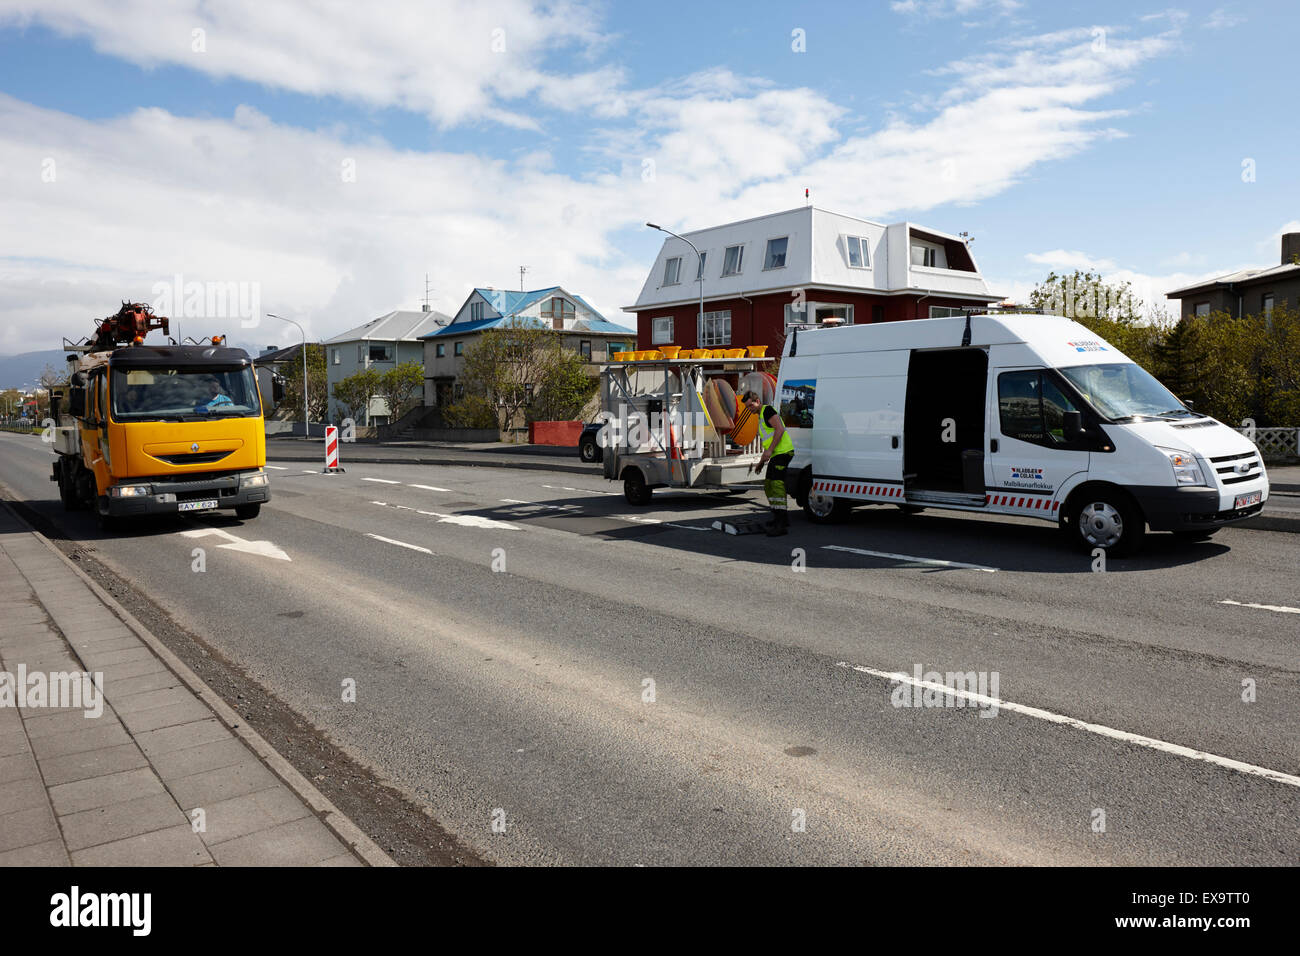 road crew out repairing potholes in reykjavik iceland - Stock Image